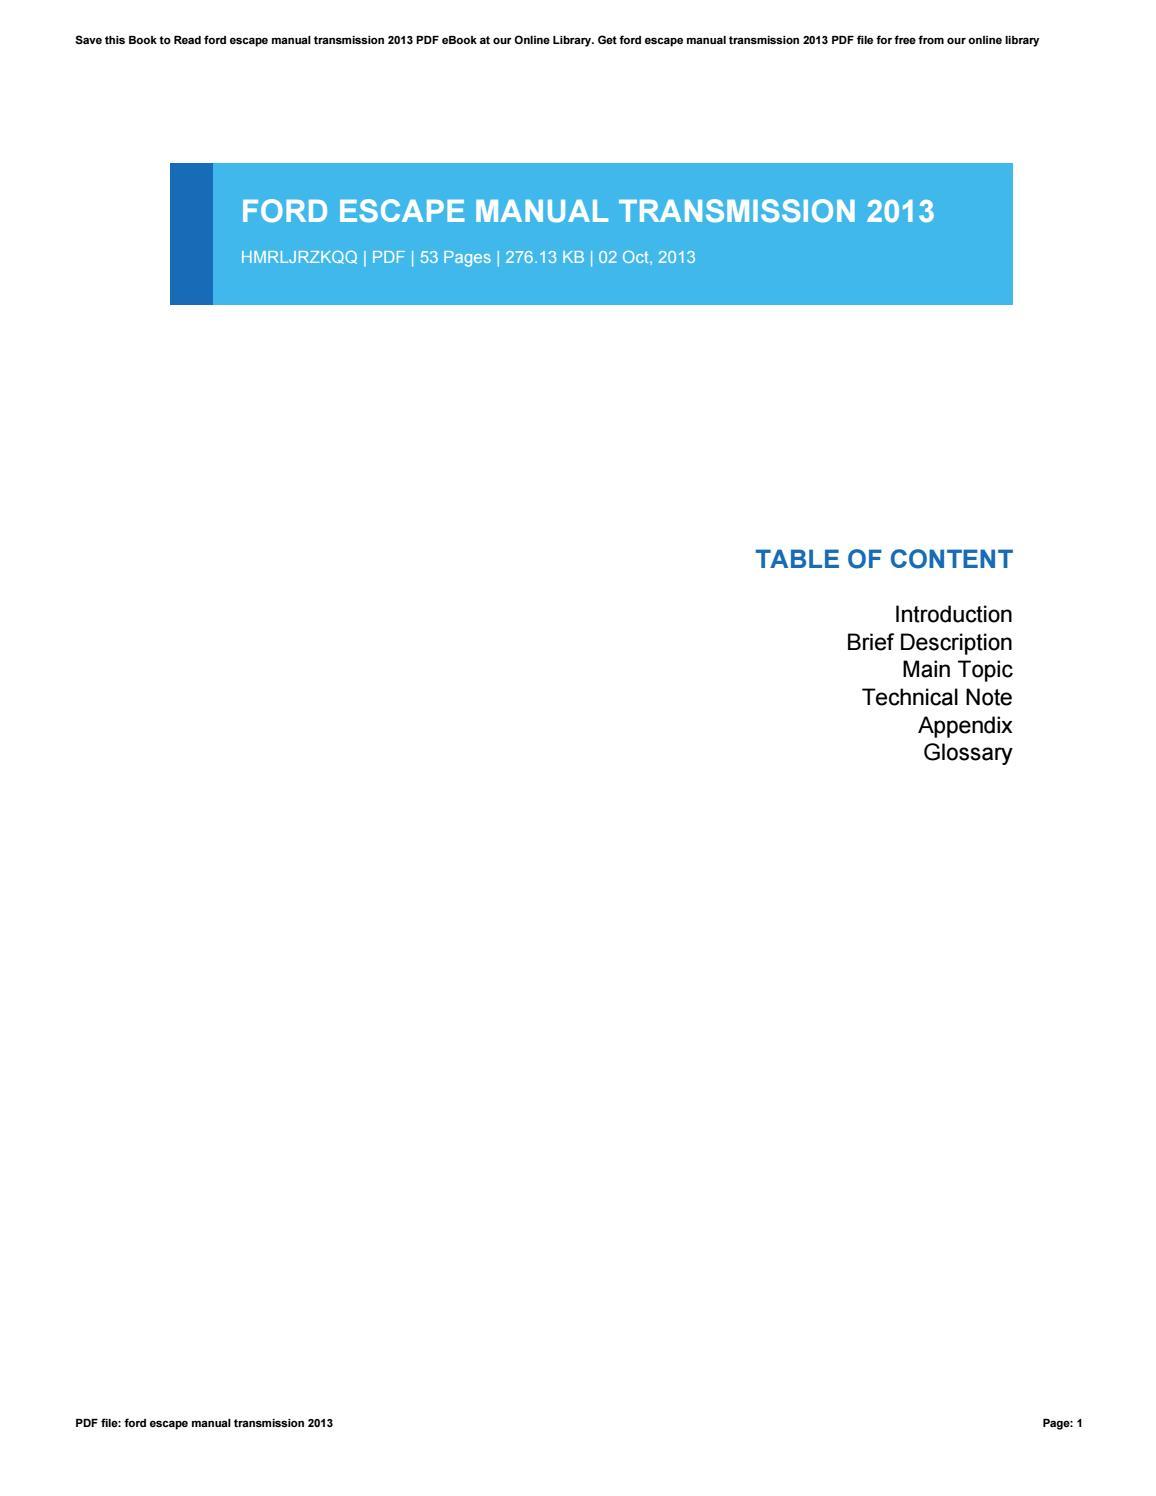 1998 freightliner fld 120 repair manuals Array - manualguide ford escape  manual transmission 2013 rh tallmonkeysmallglass com